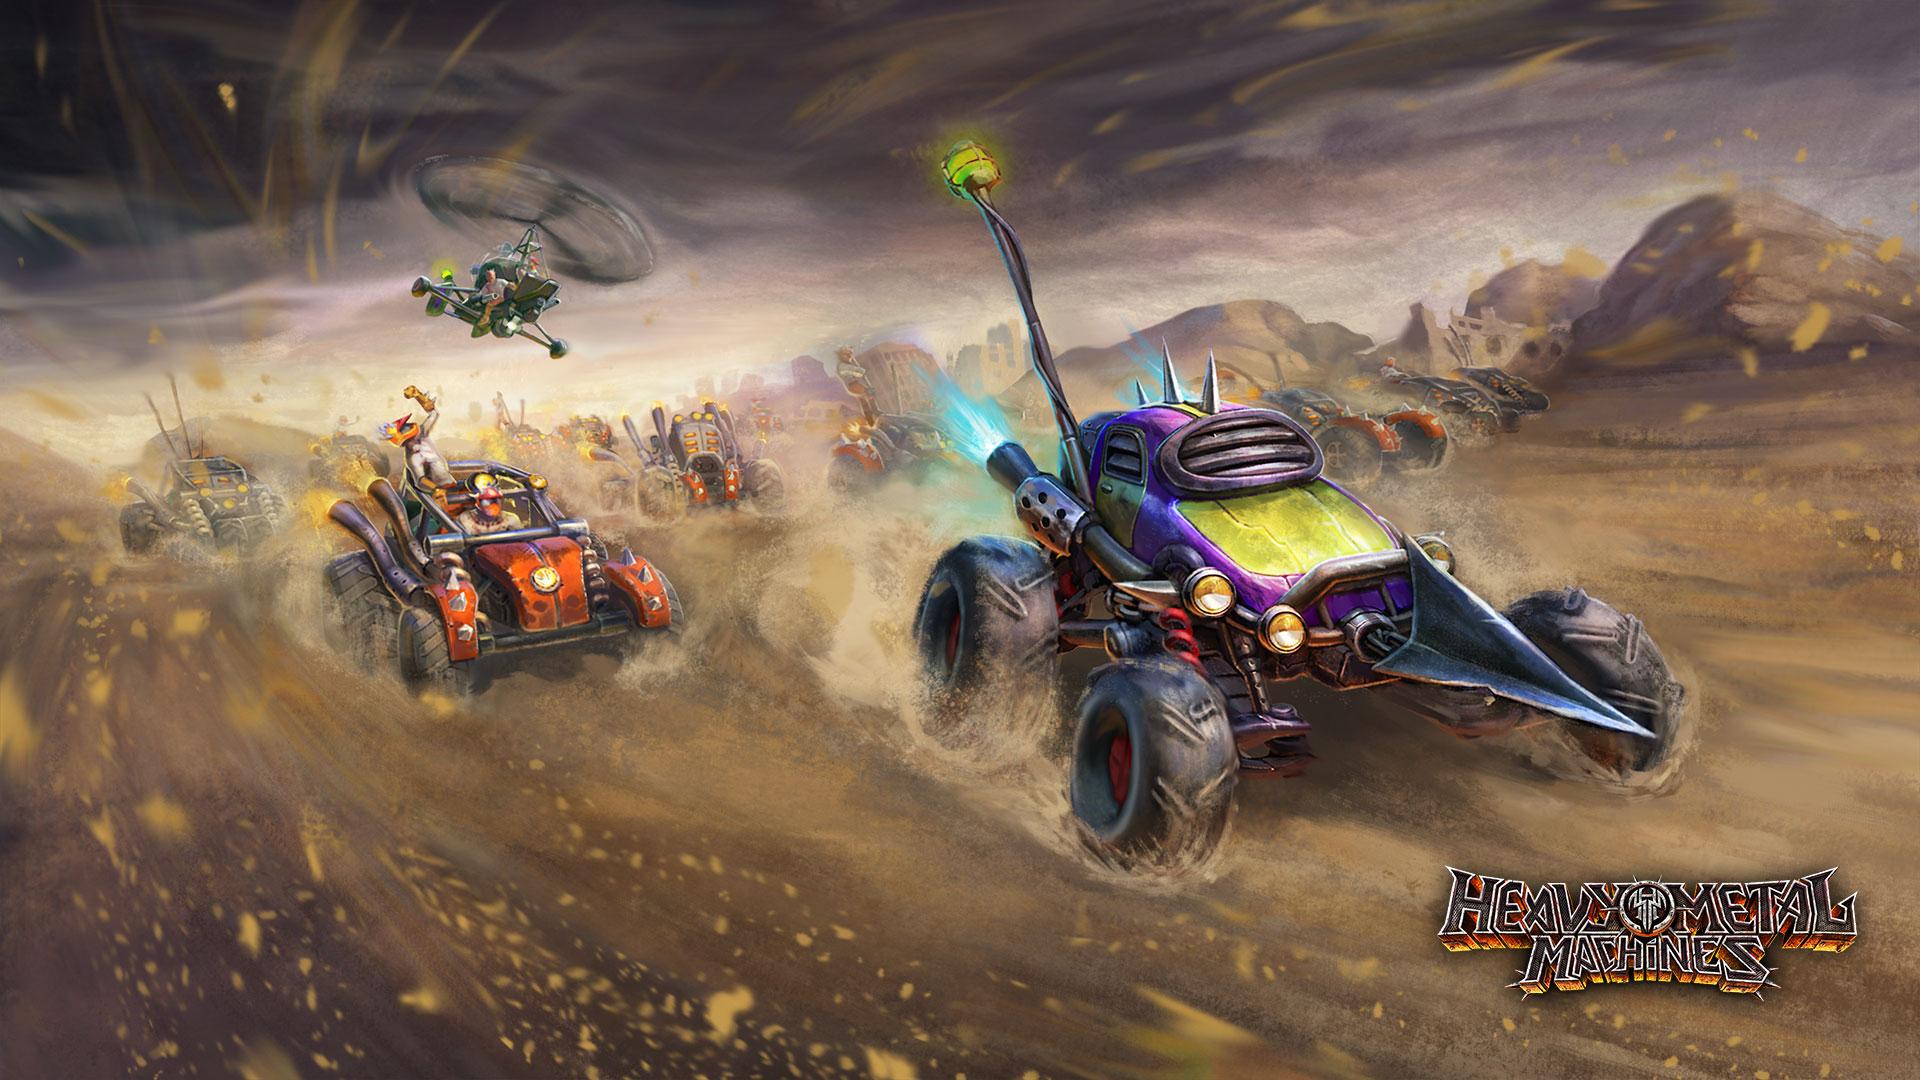 dirtdevil _ Heavy Metal Machines